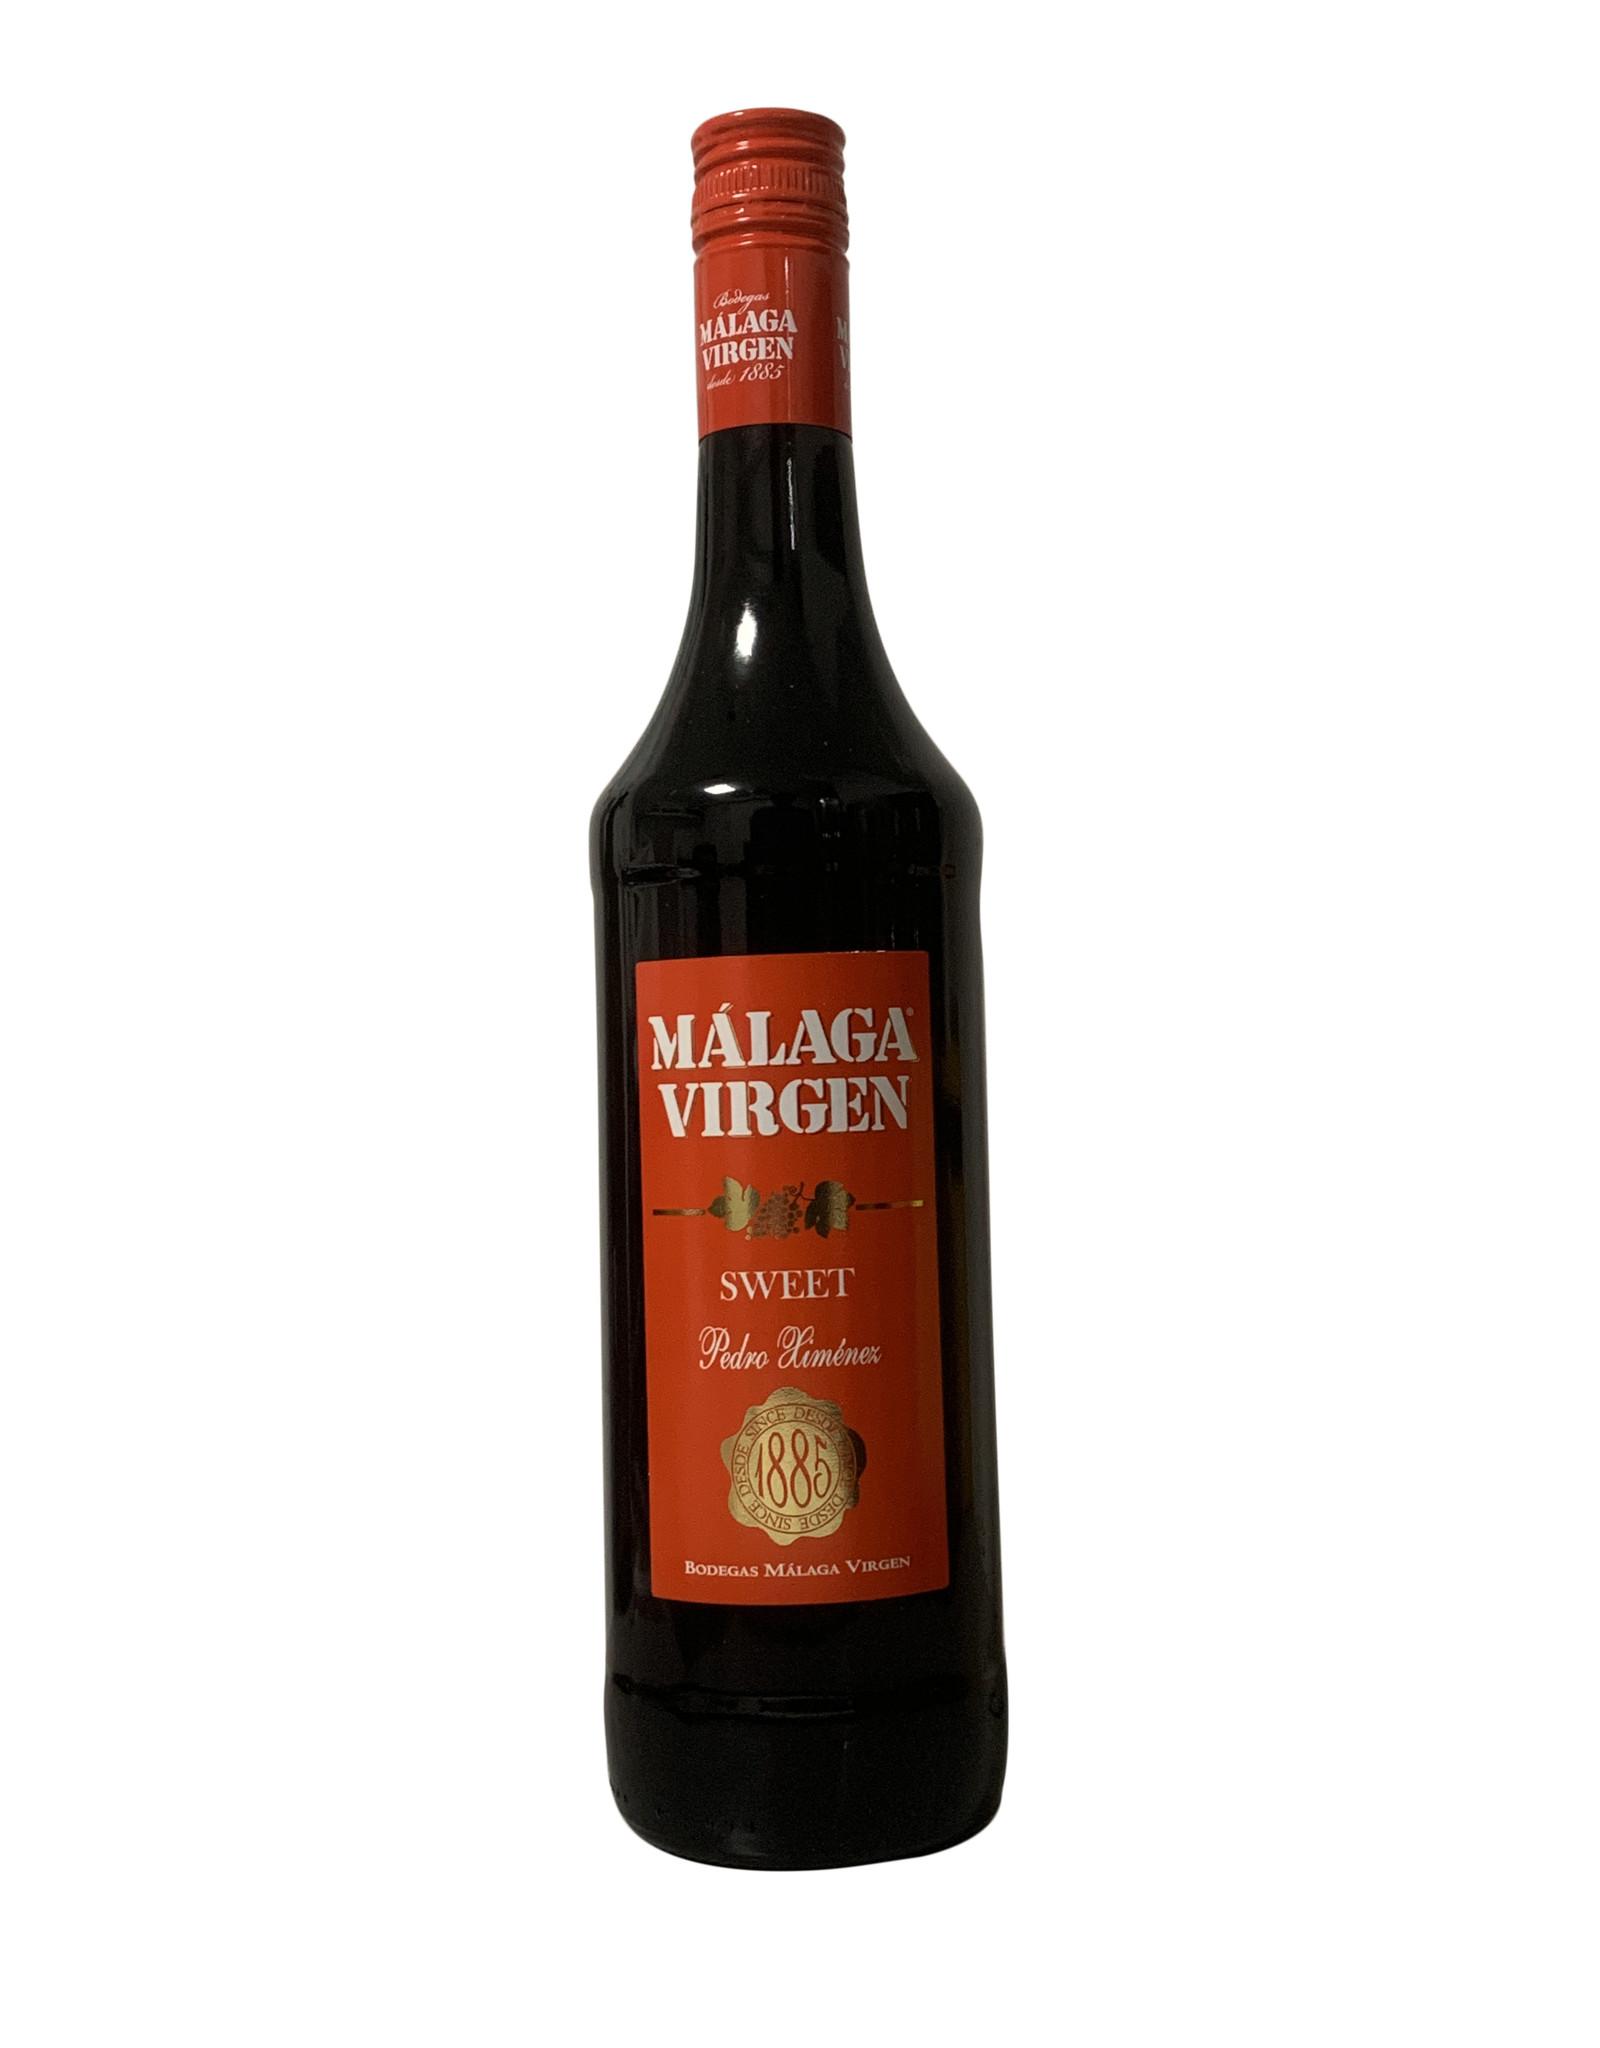 Bodegas Malaga Virgen Bodegas Malaga Pedro Ximenez Sweet Malaga Wine, Andalusia, Spain (750mL)